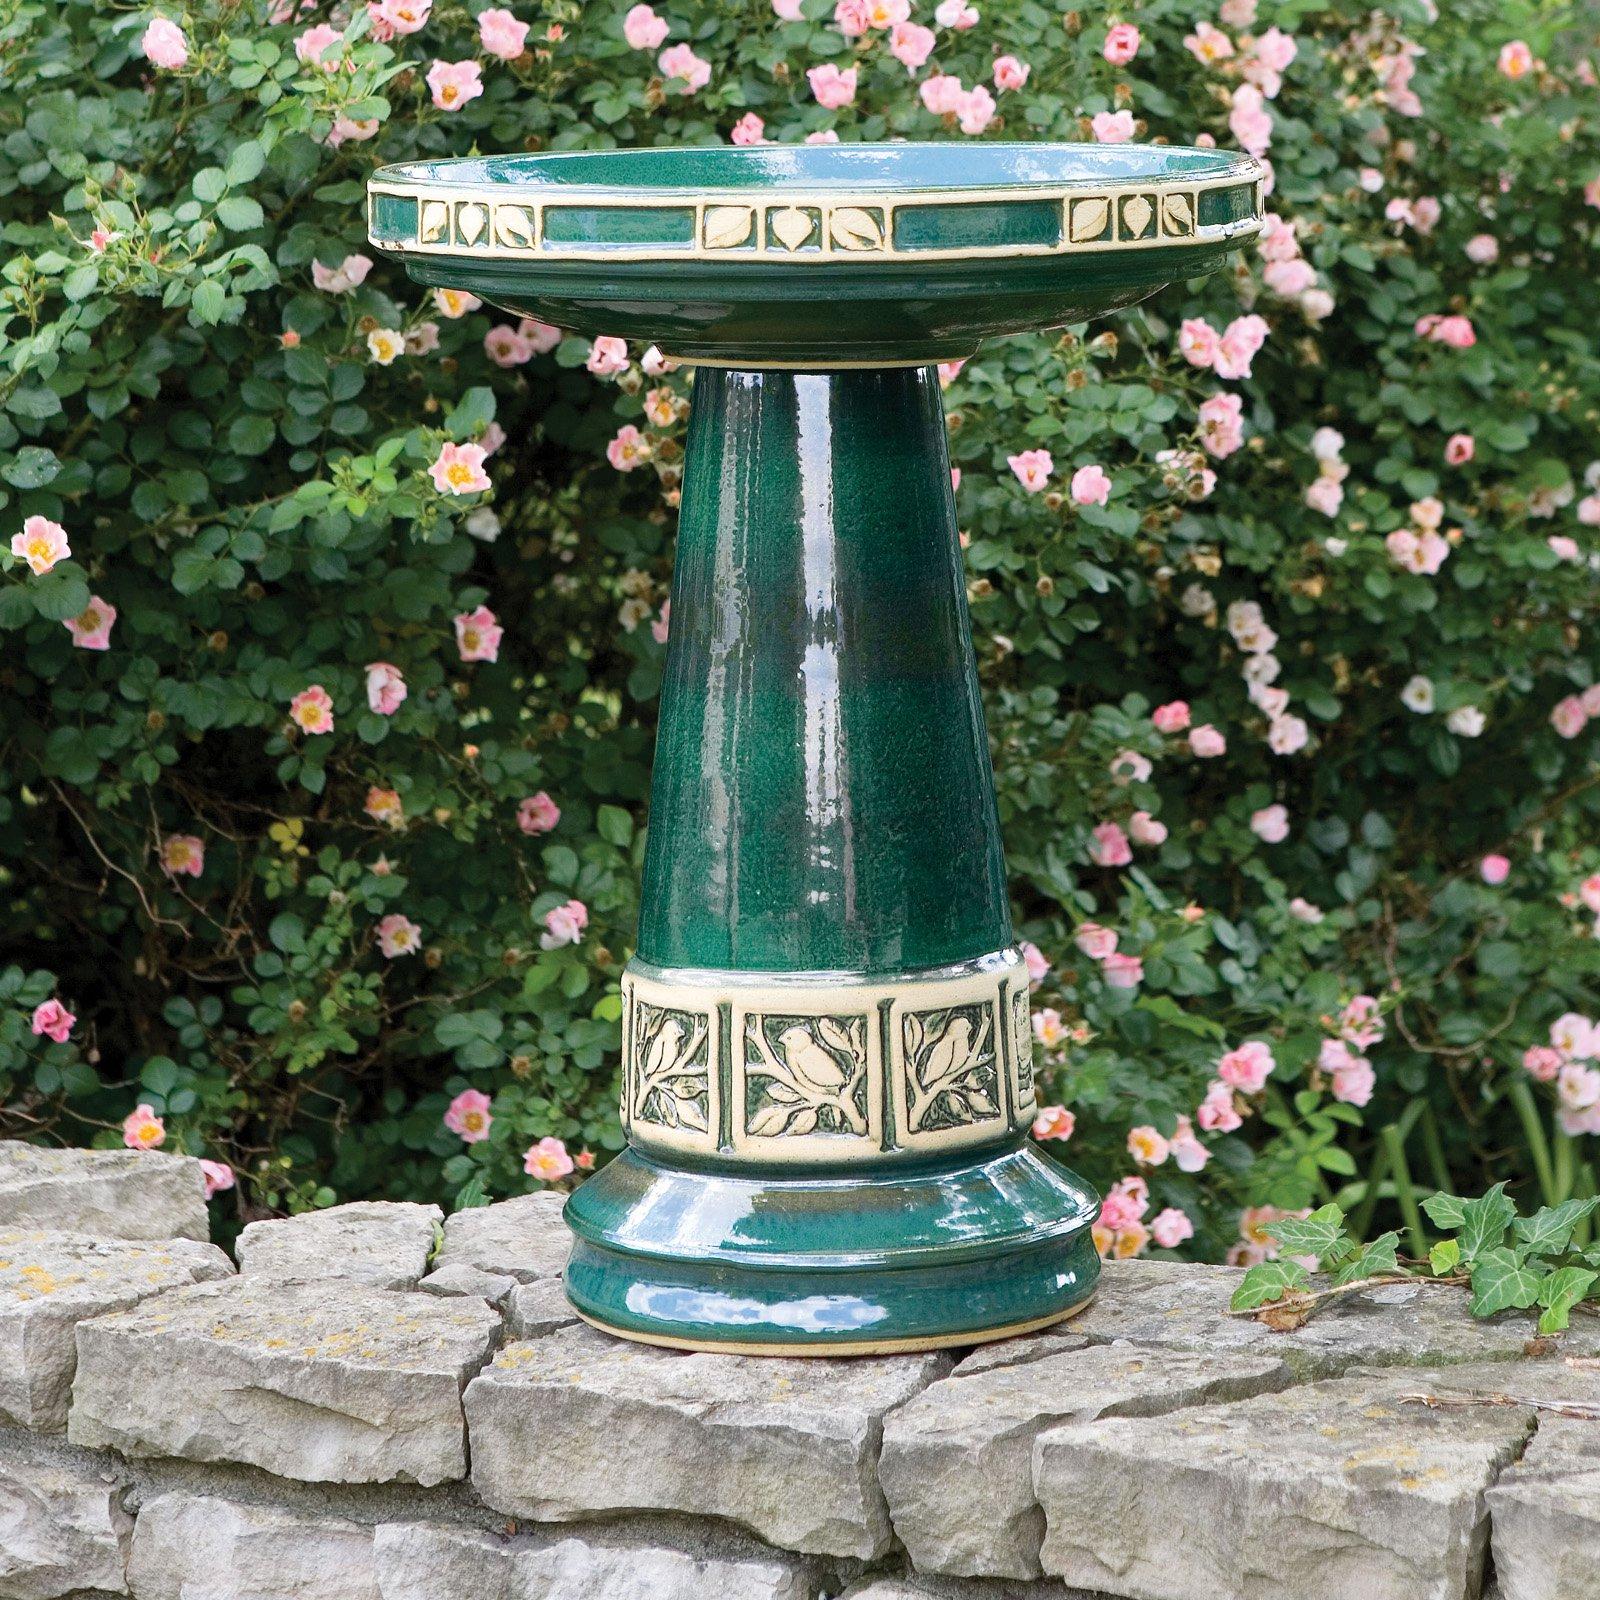 Burley Clay Zanesville Glazed Juniper Green Ceramic Birdbath by Backyard Nature Products Inc